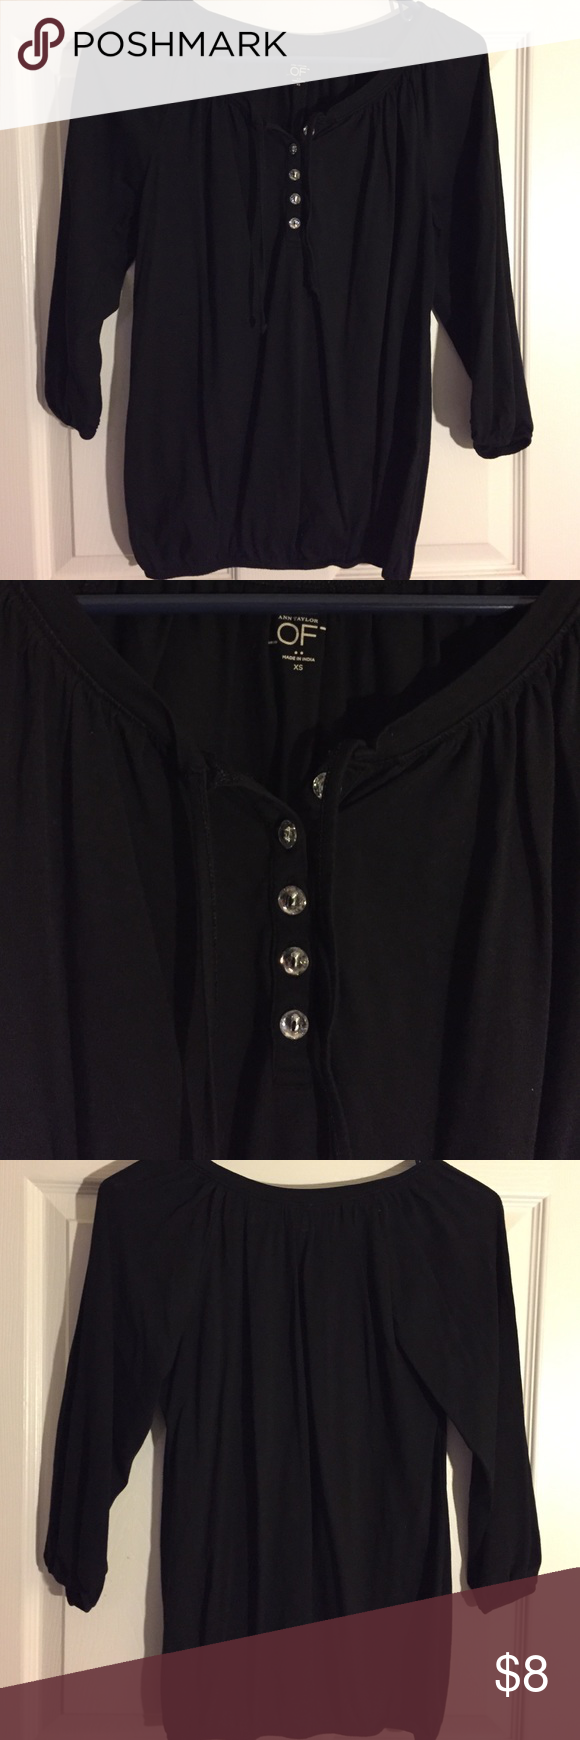 Loft 3/4 sleeve Size XS LOFT Tops Tees - Long Sleeve